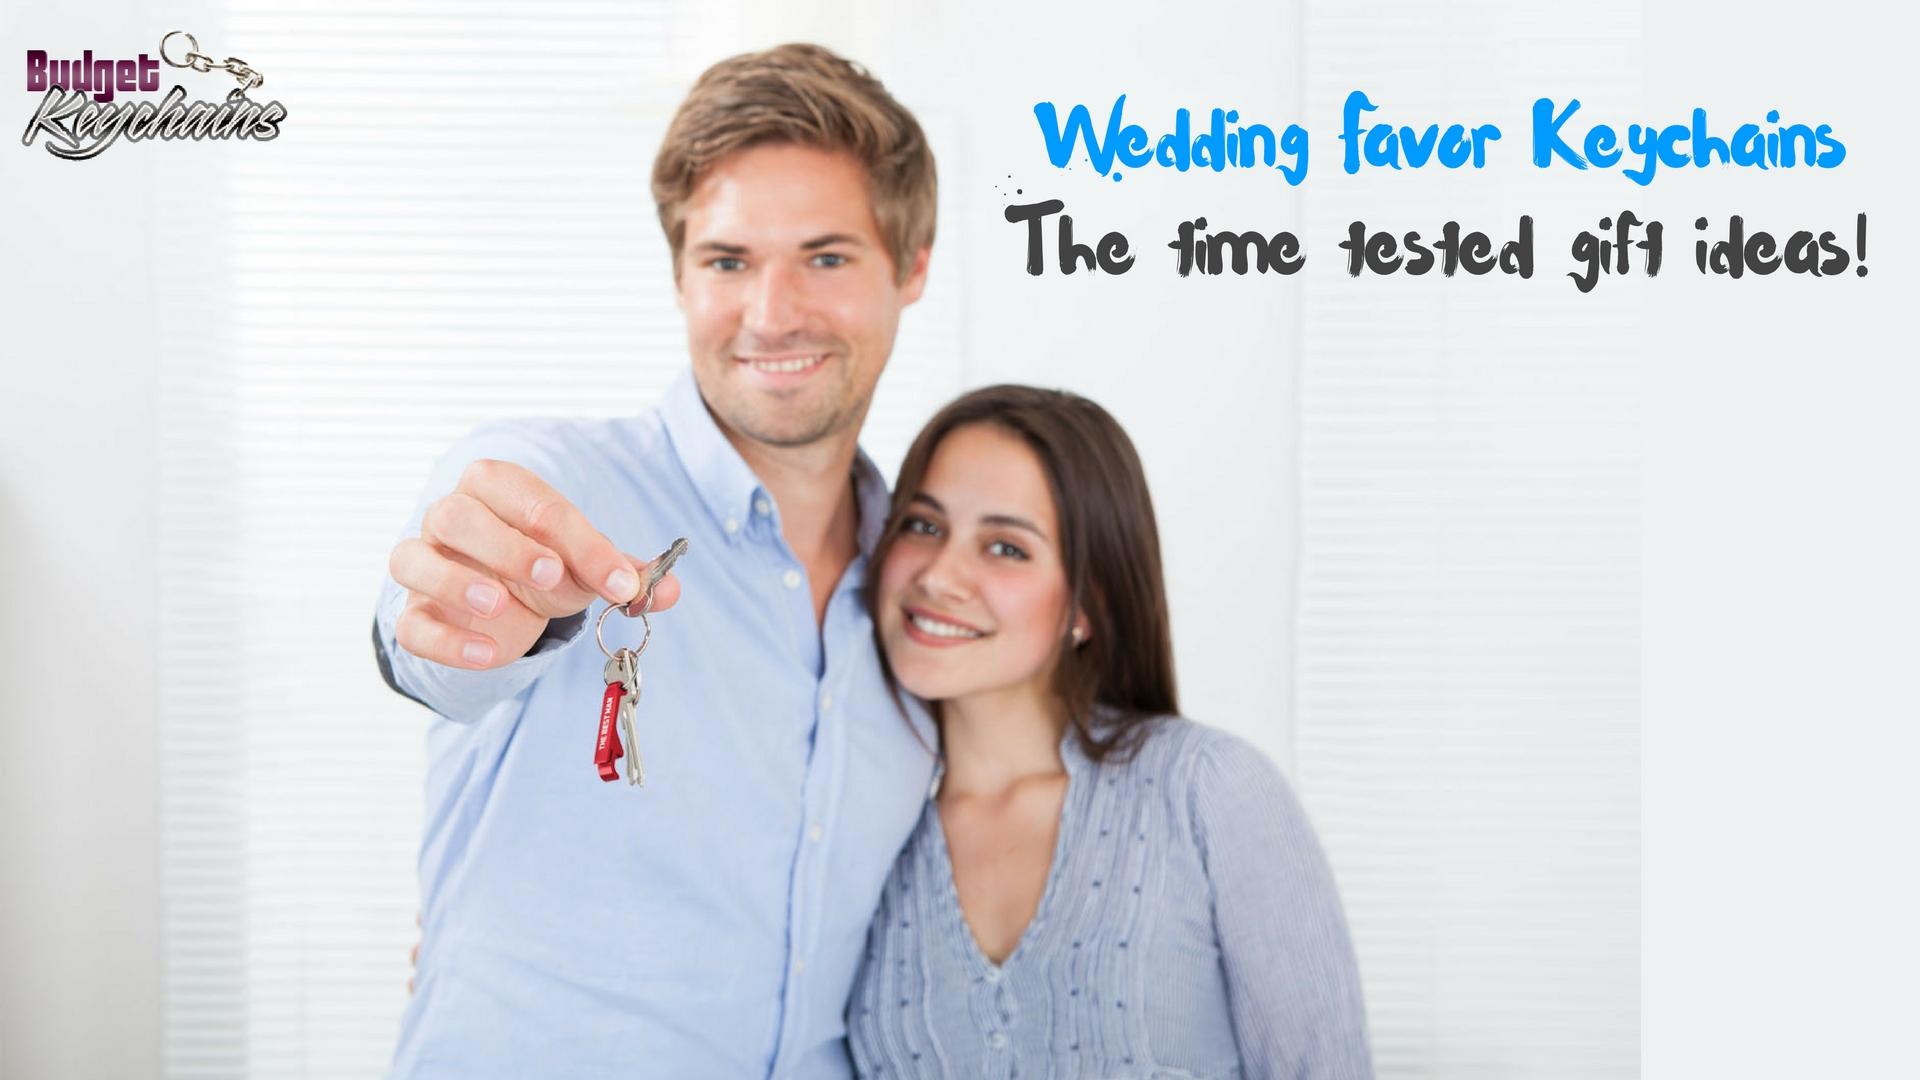 weddingFavor-keychains-popular-giftIdeas